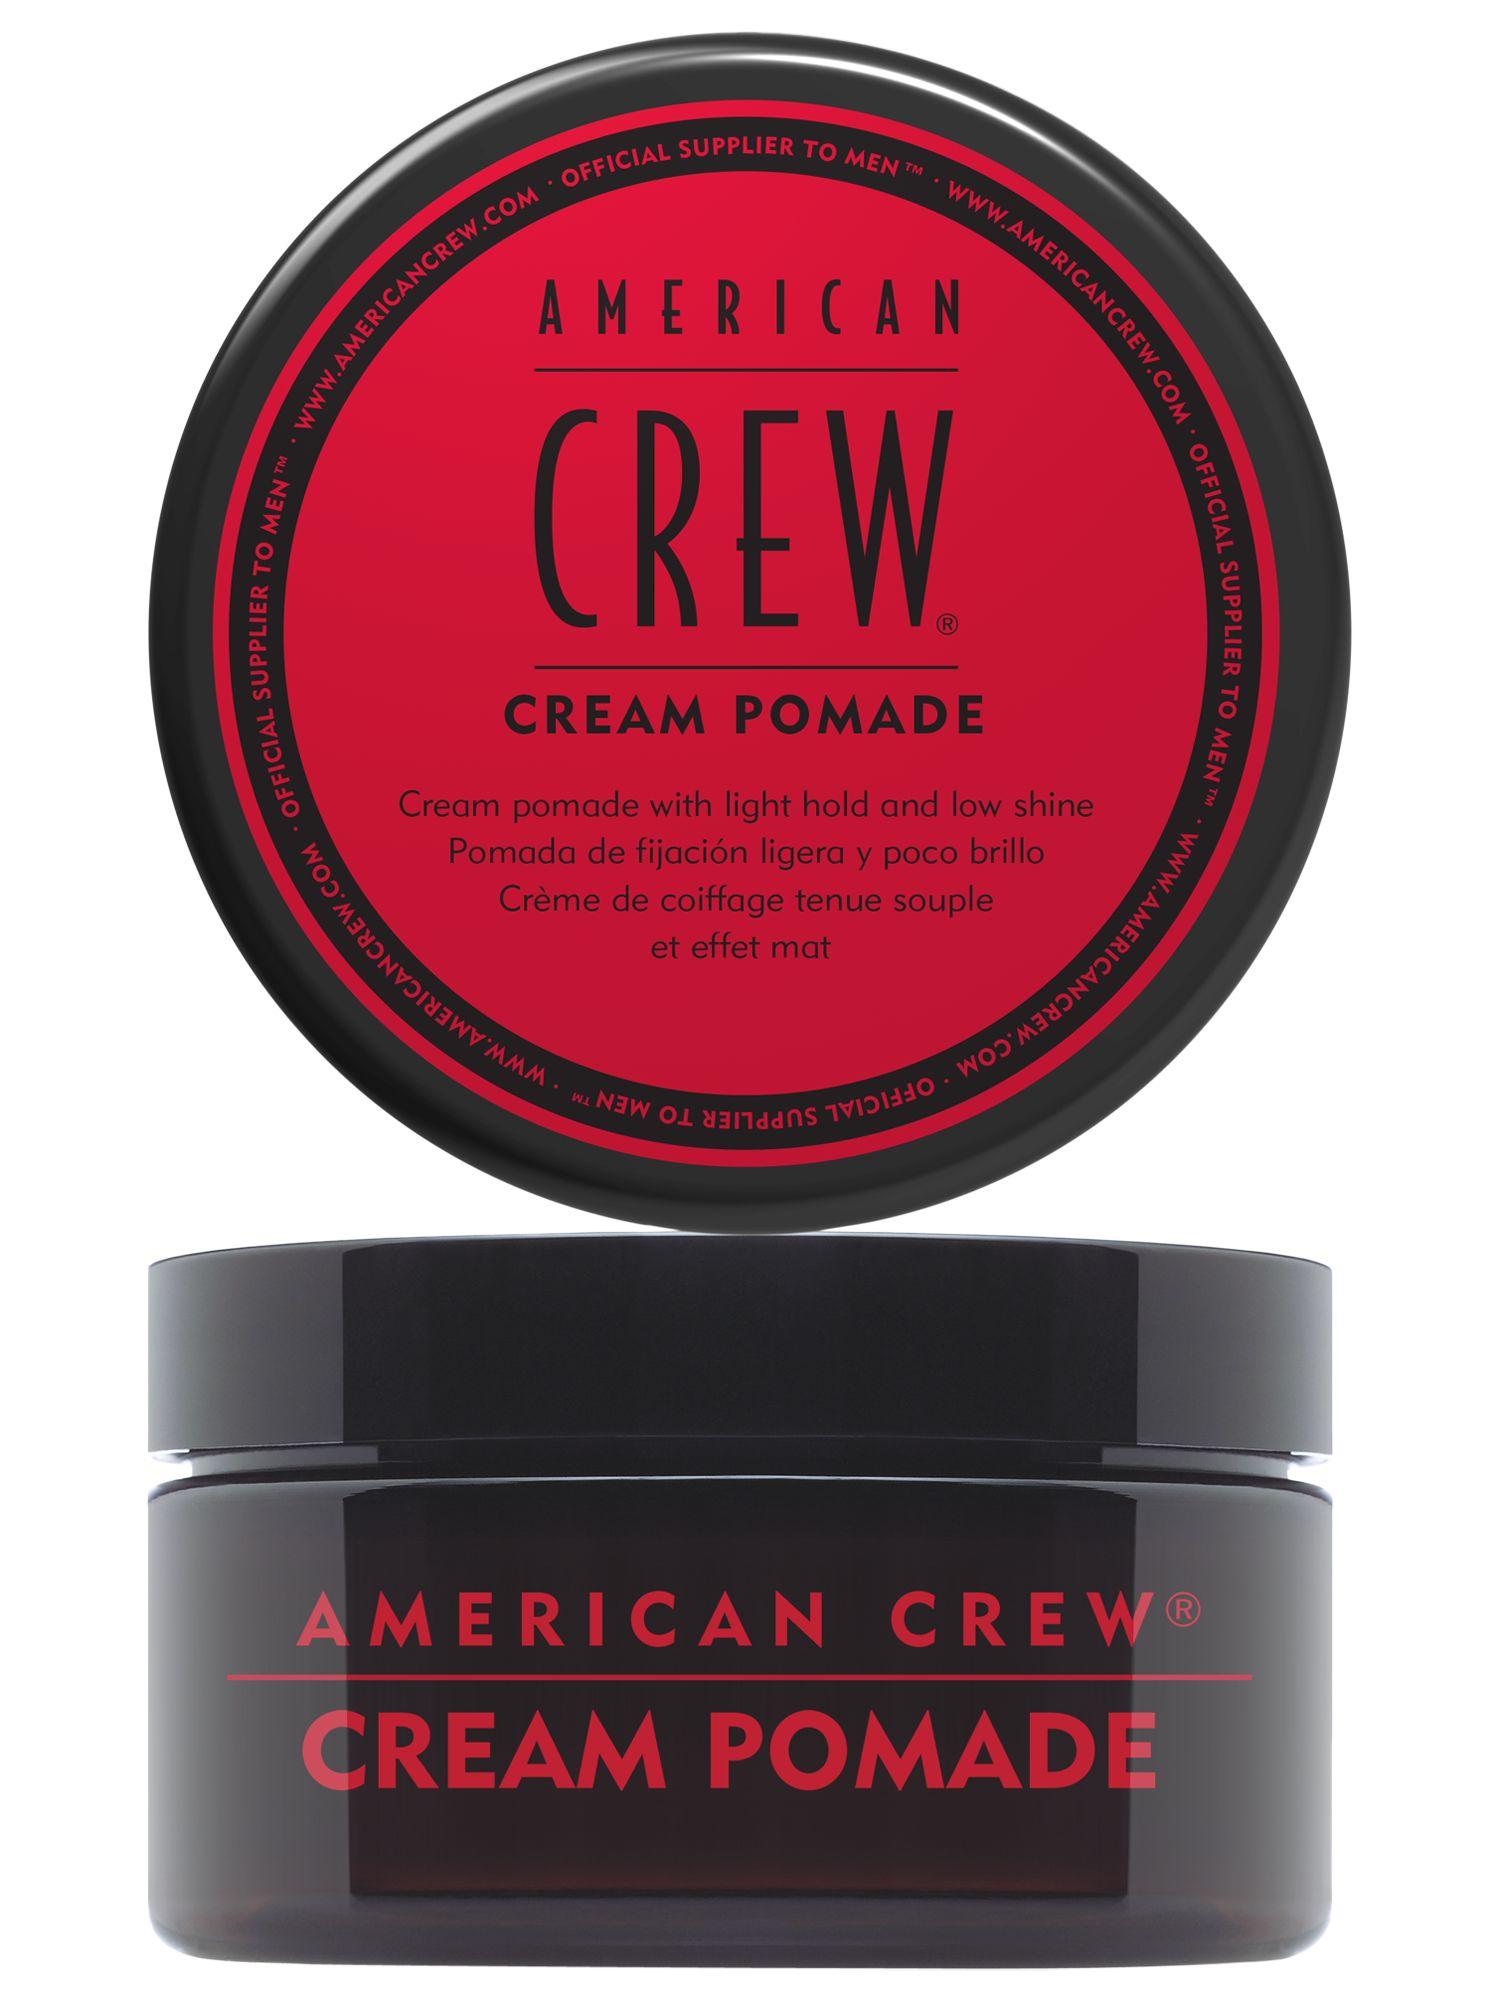 American Crew American Crew Cream Pomade, 85g